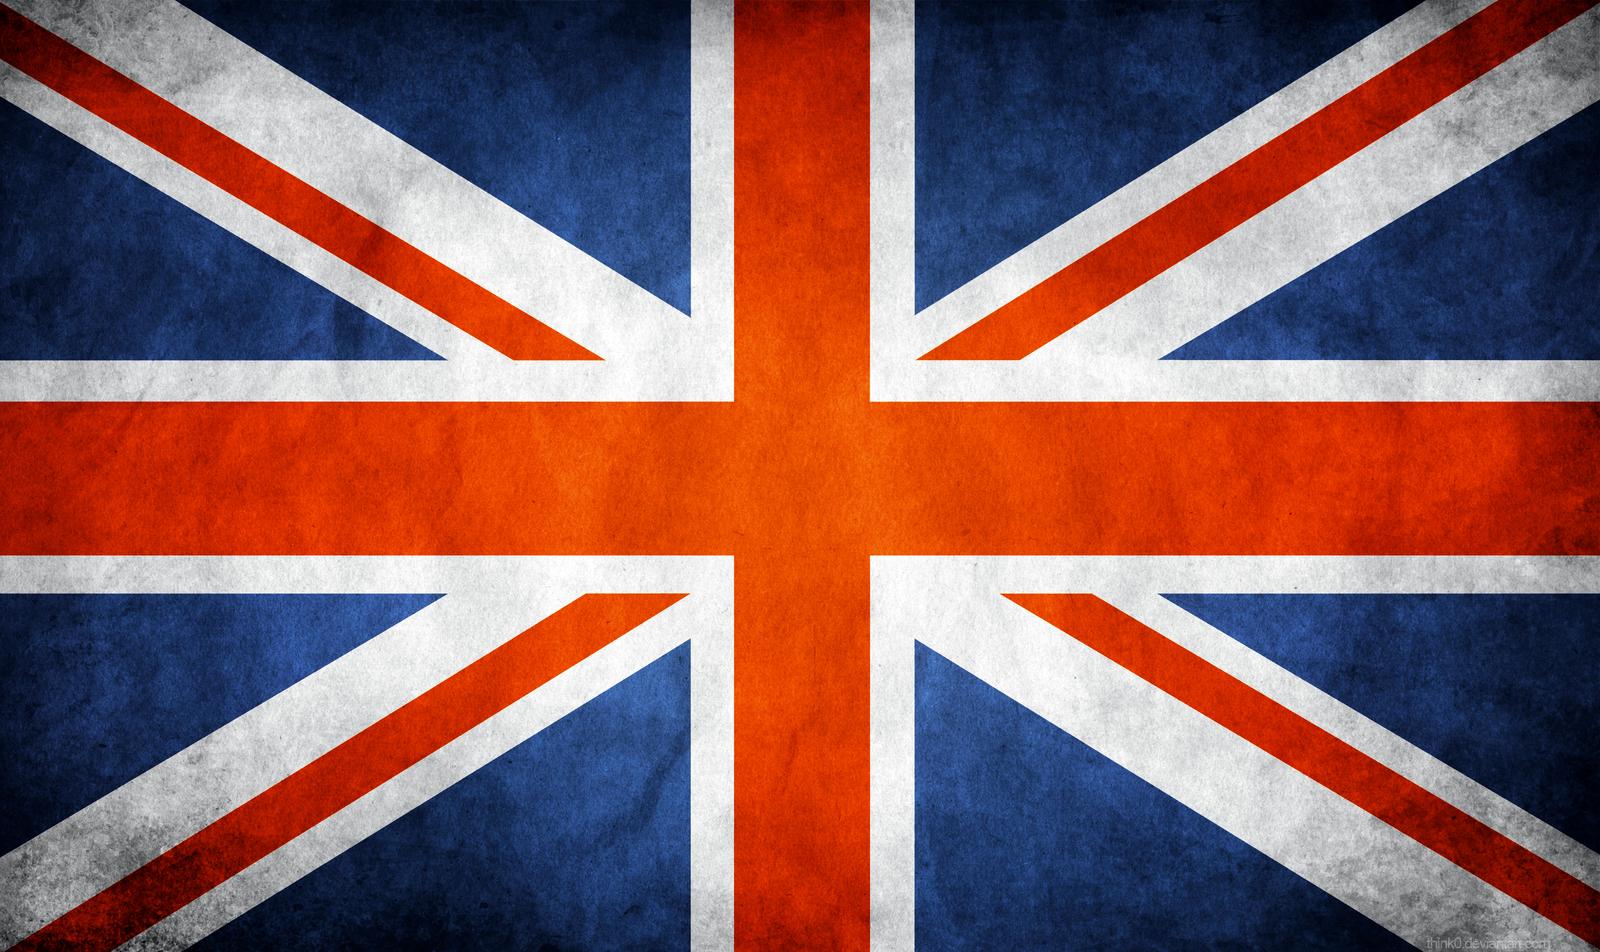 wallpaper hdtv widescreen great britain united kingdom grunge flag 1600x952